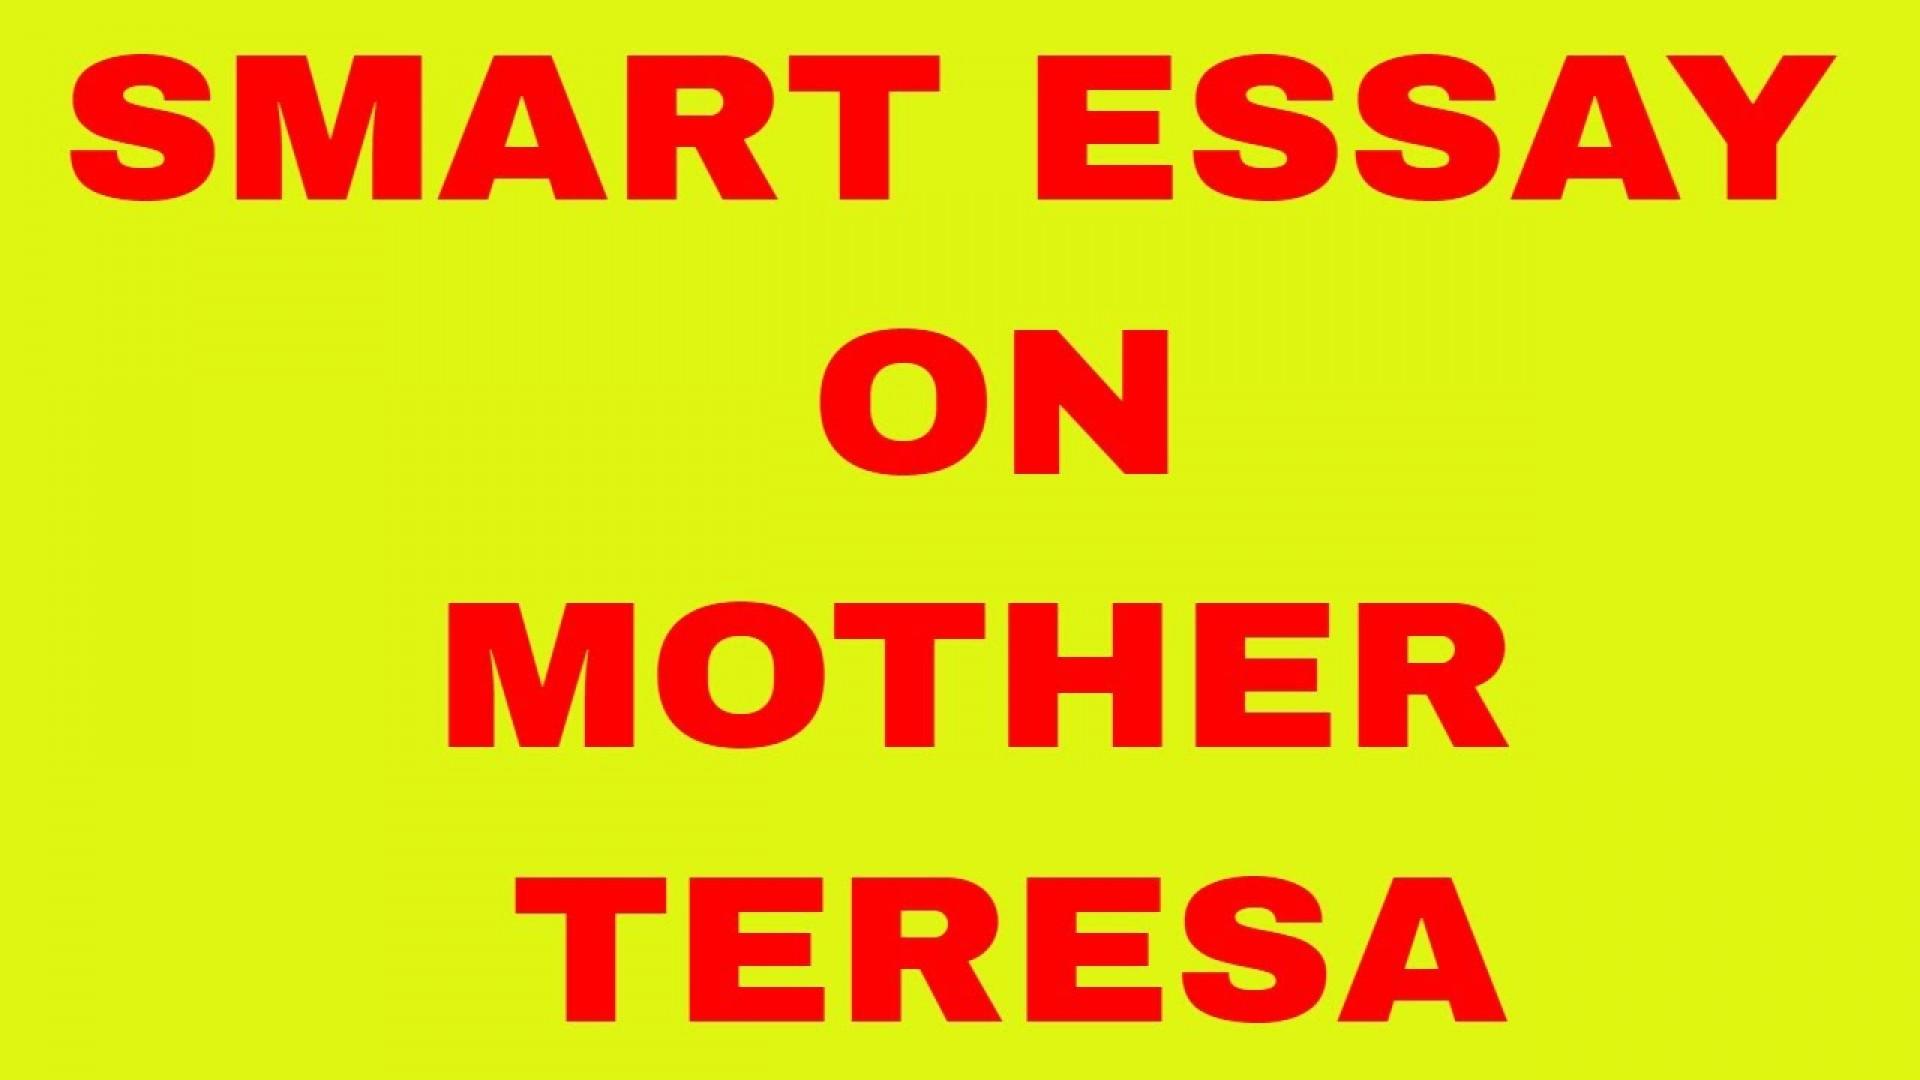 007 Mother Teresa Essay Maxresdefault Fantastic In Marathi Hindi Me 1920